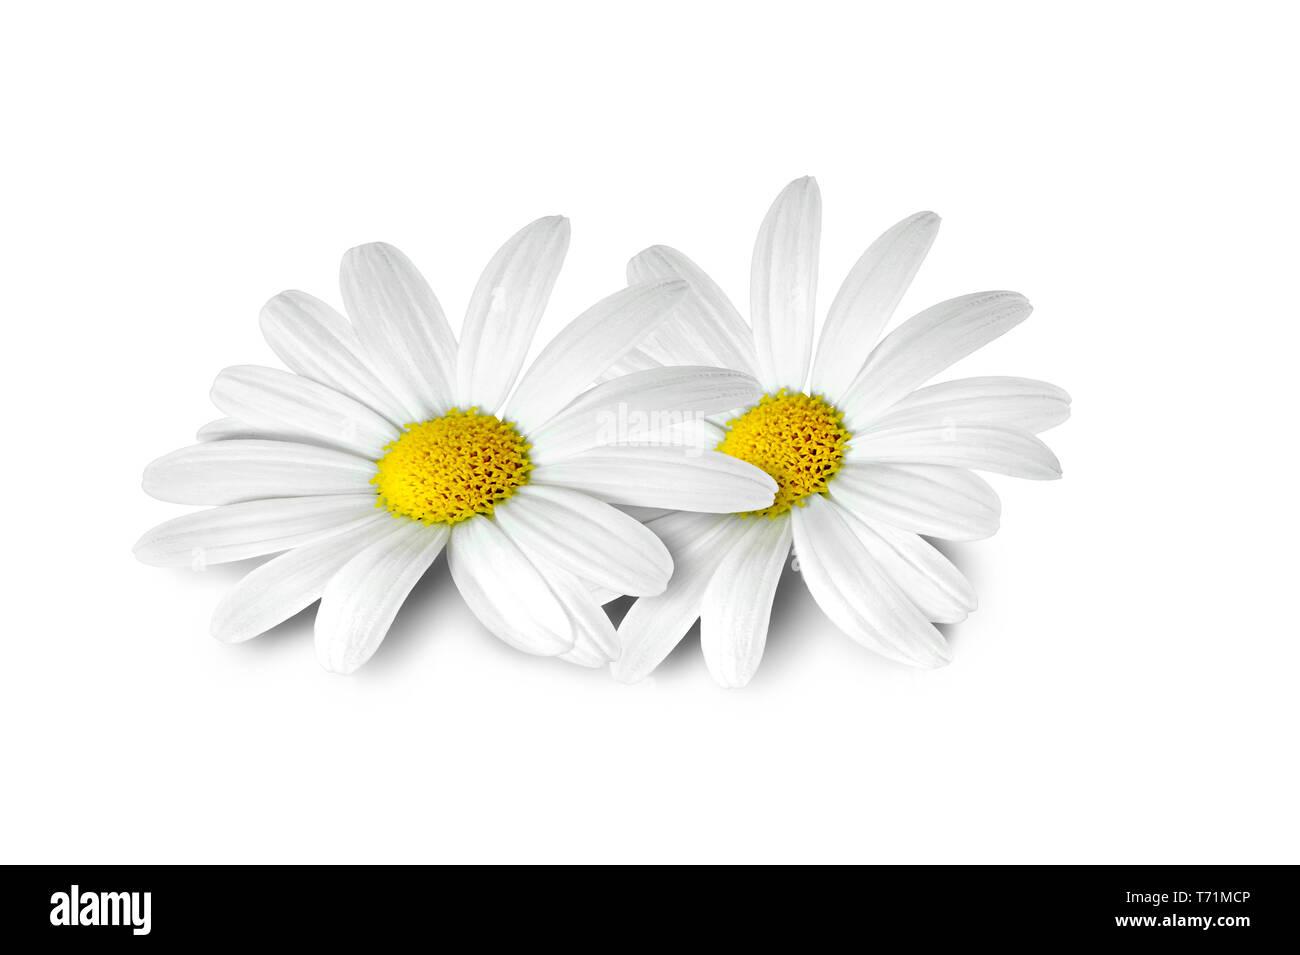 131 fleurs Photo Stock